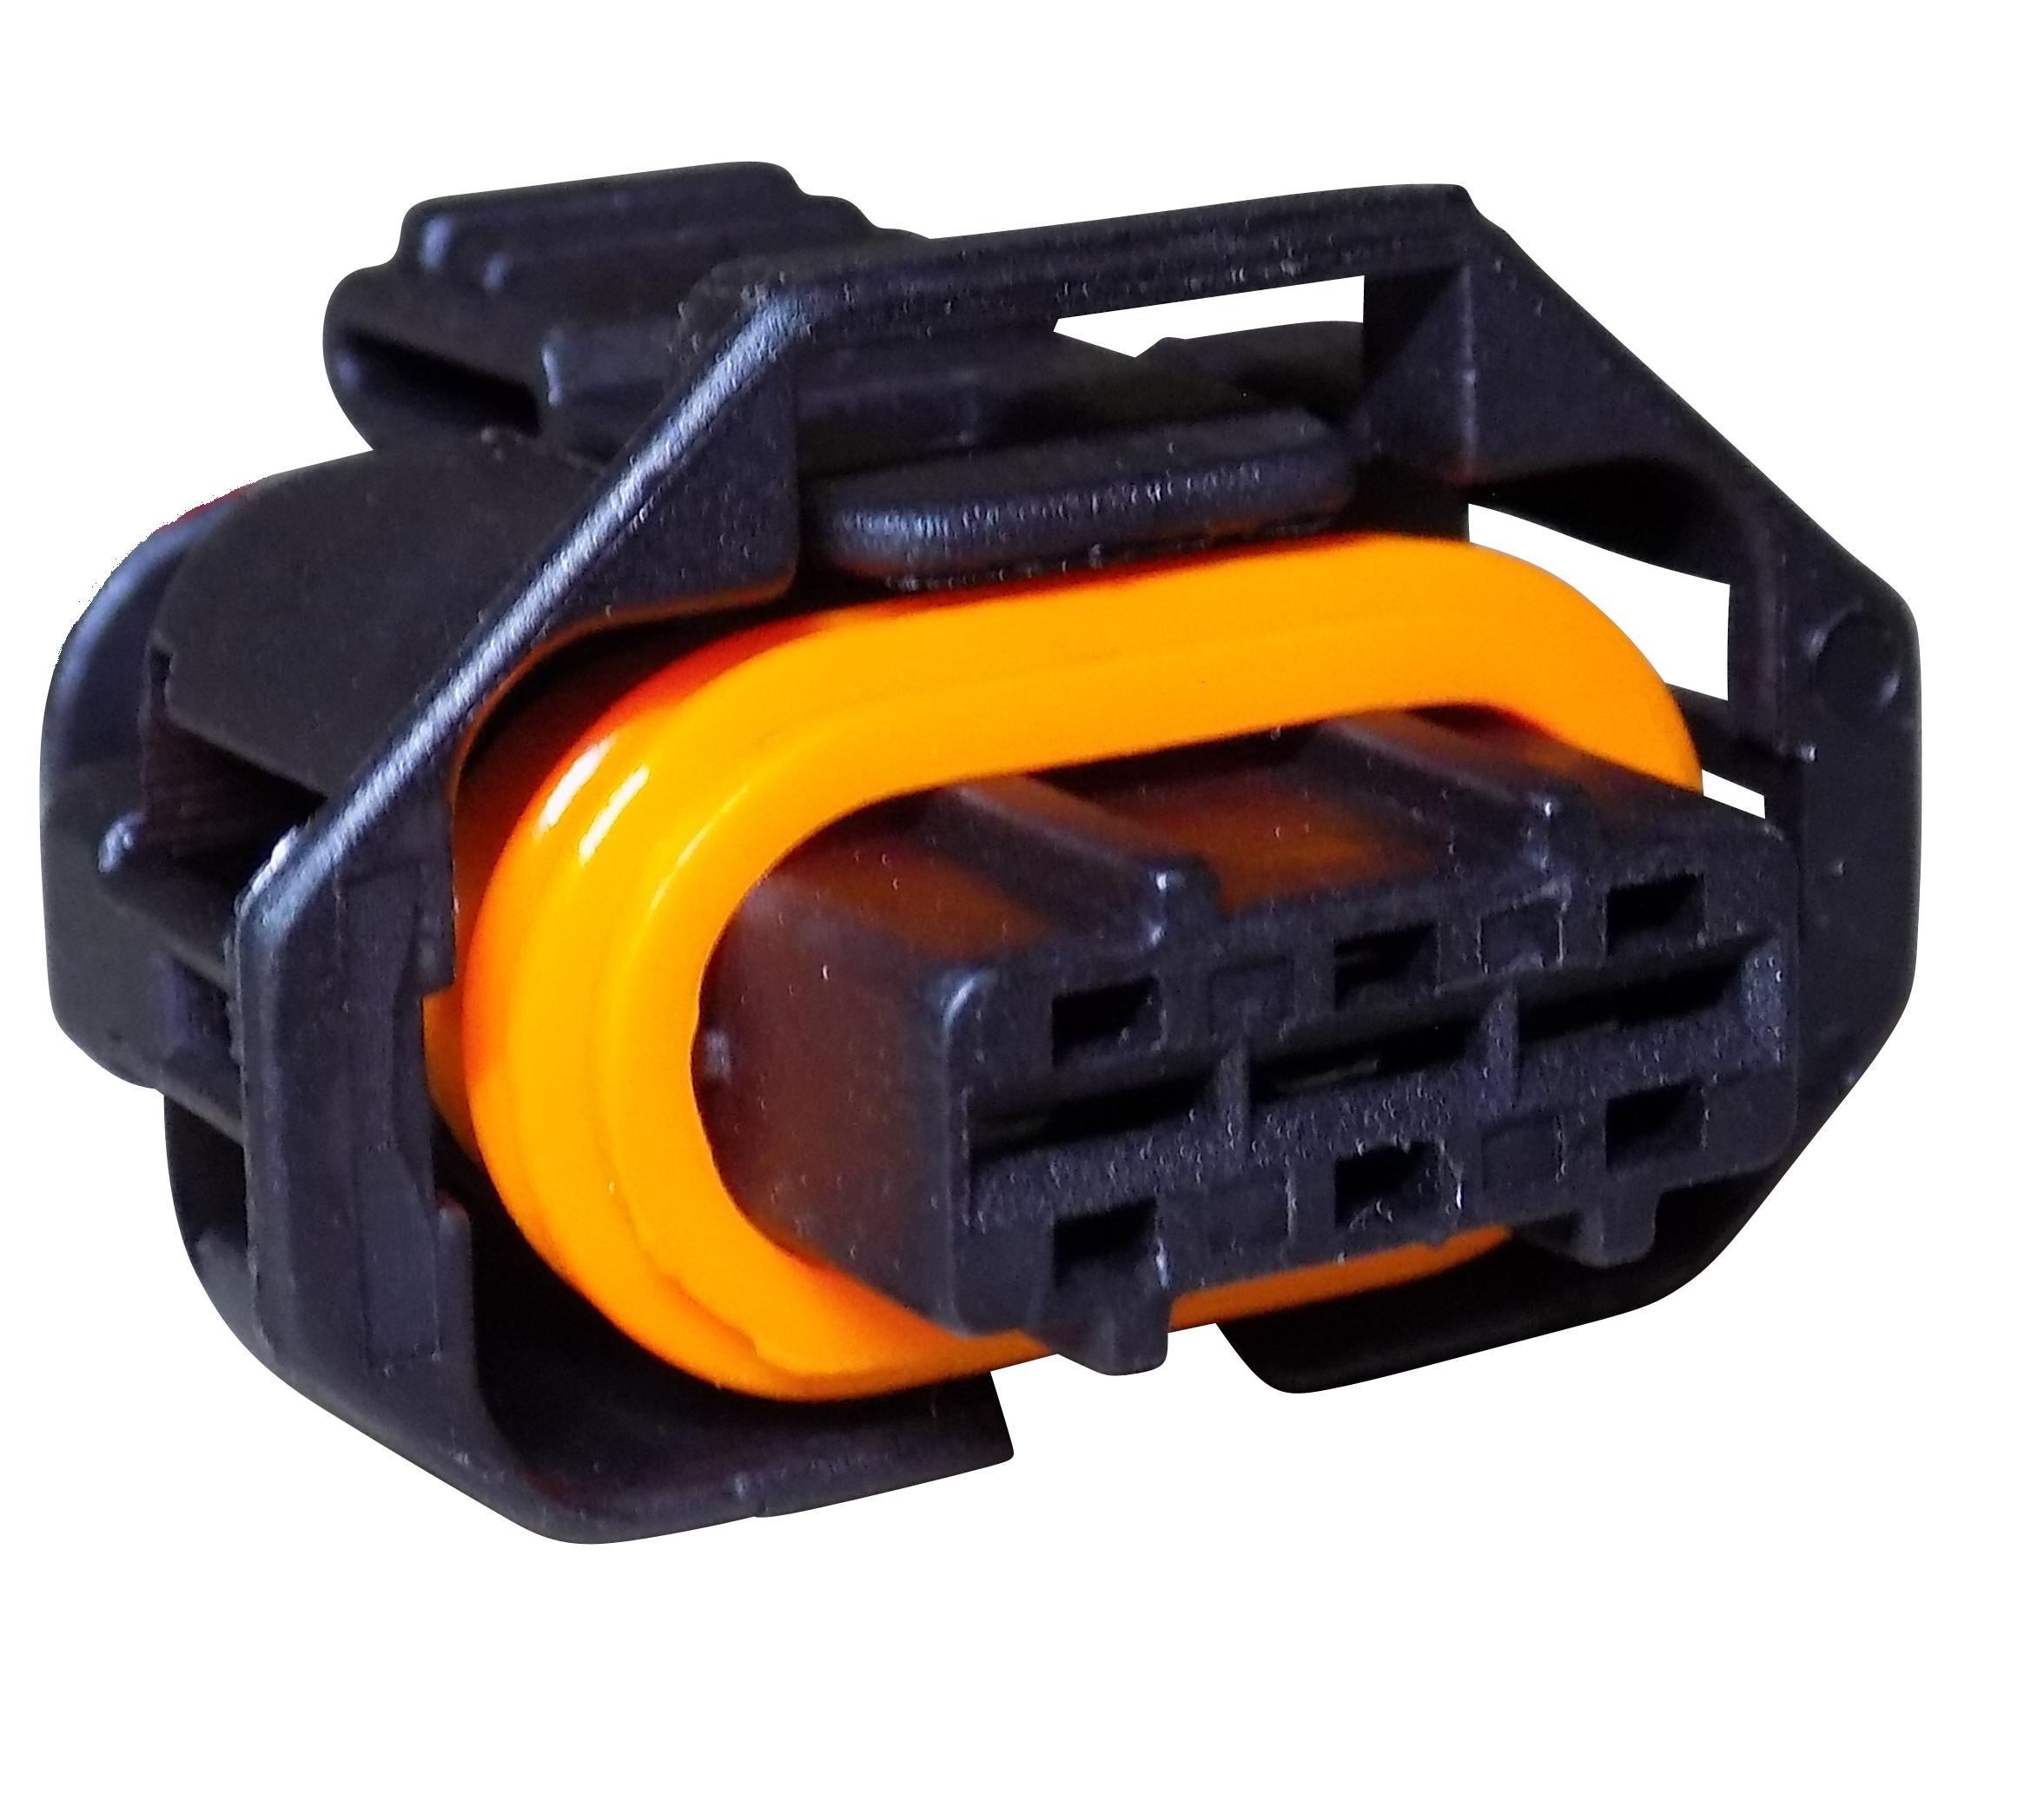 Fuel Rail Sensor Wiring Harness Repair Pigtail Connector 66l Lly Duramax Part Number Kb Lml Frsp